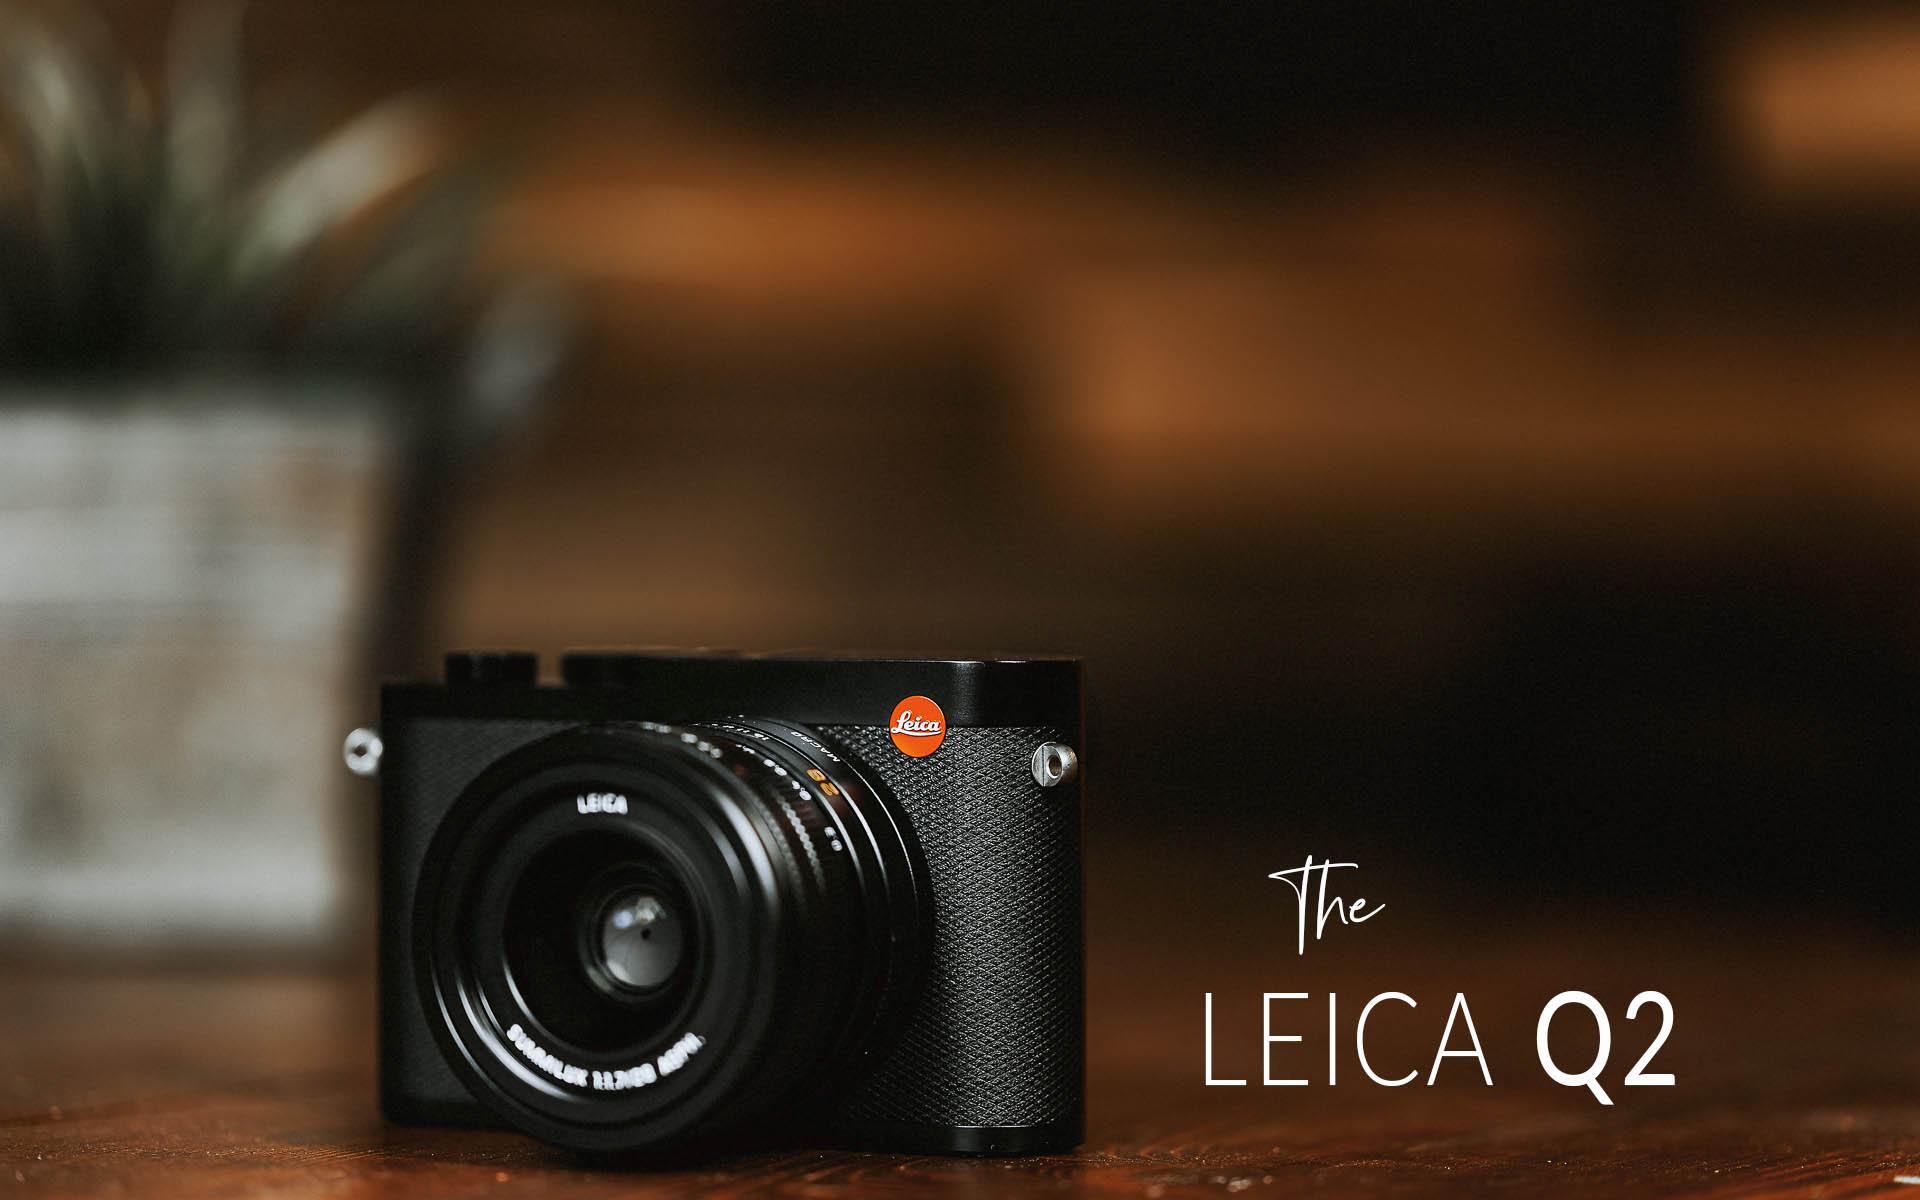 Leica Q2 Review